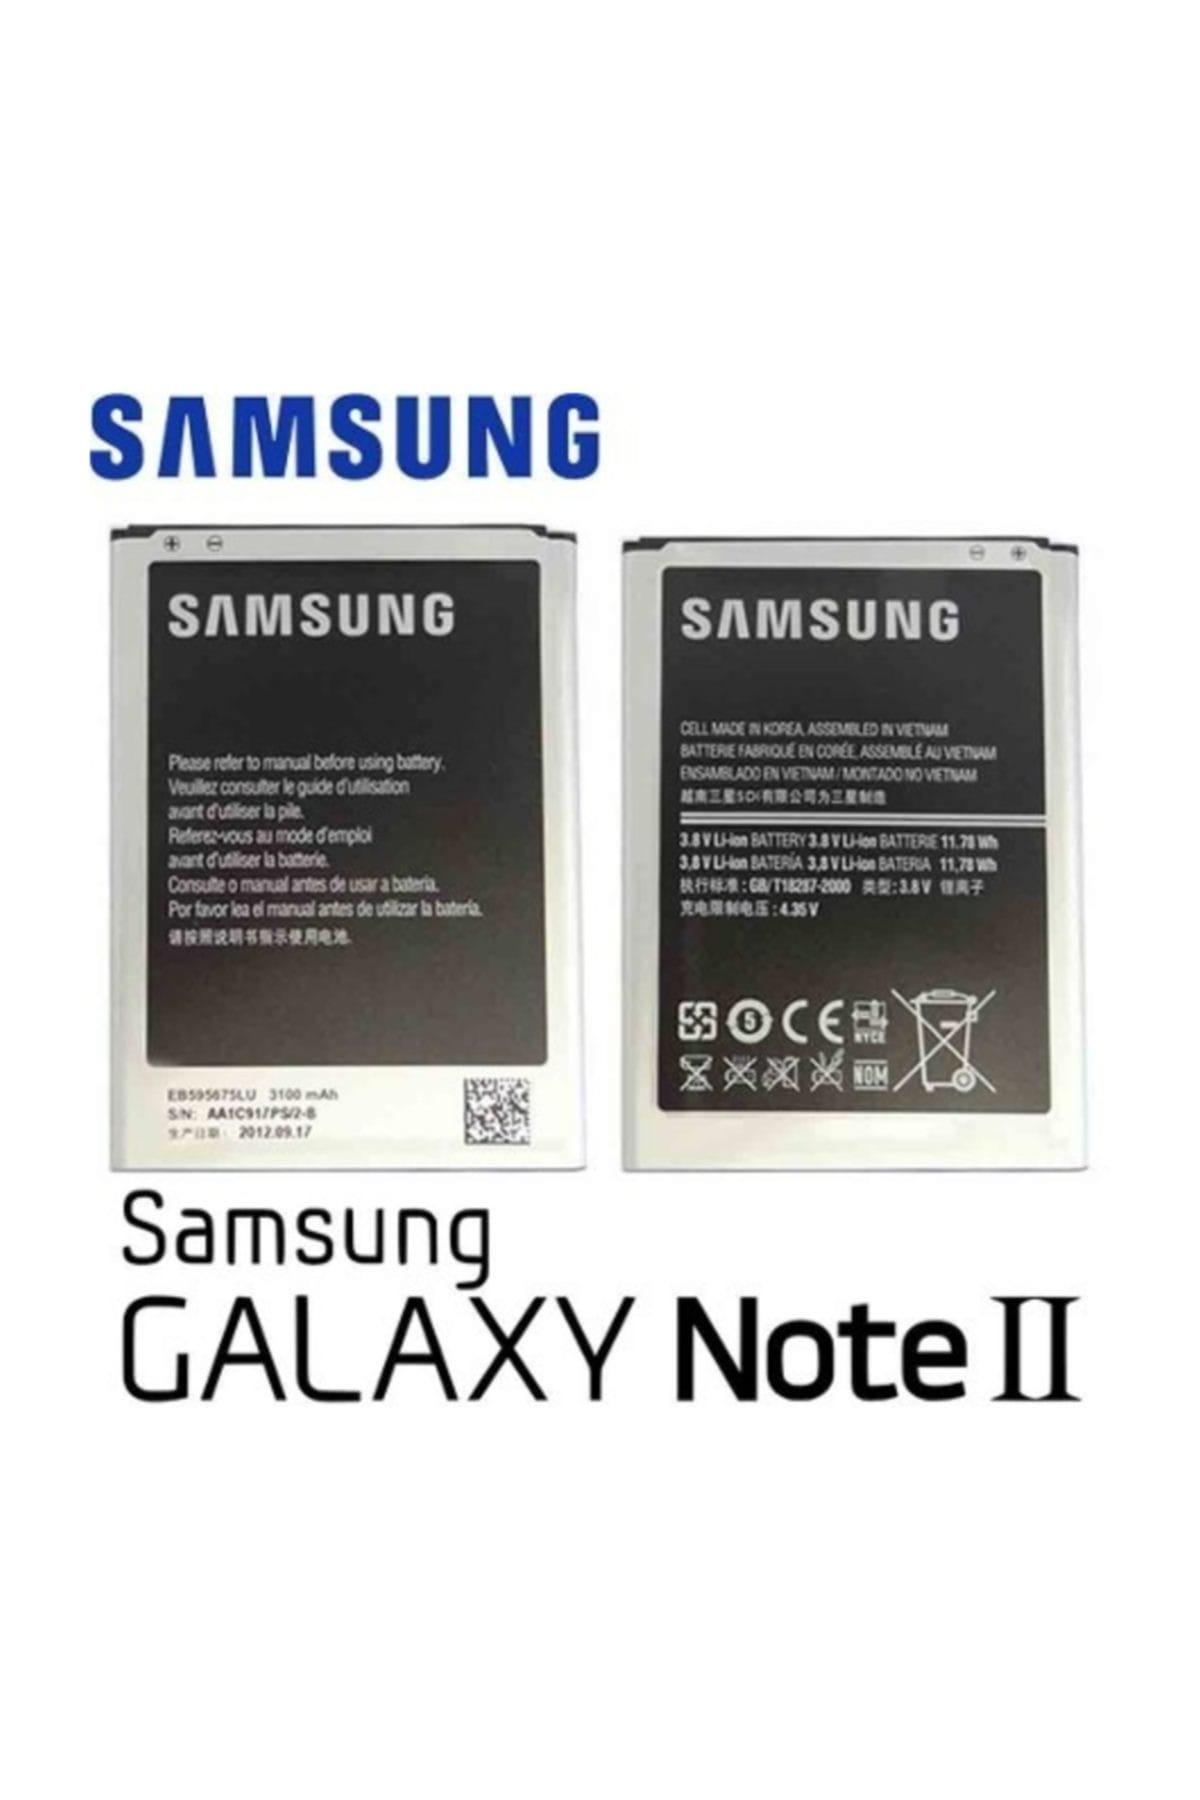 Samsung NOTE 2 NOTE II N7100 BATARYA PİL 3100 MAH Fiyatı, Yorumları -  Trendyol